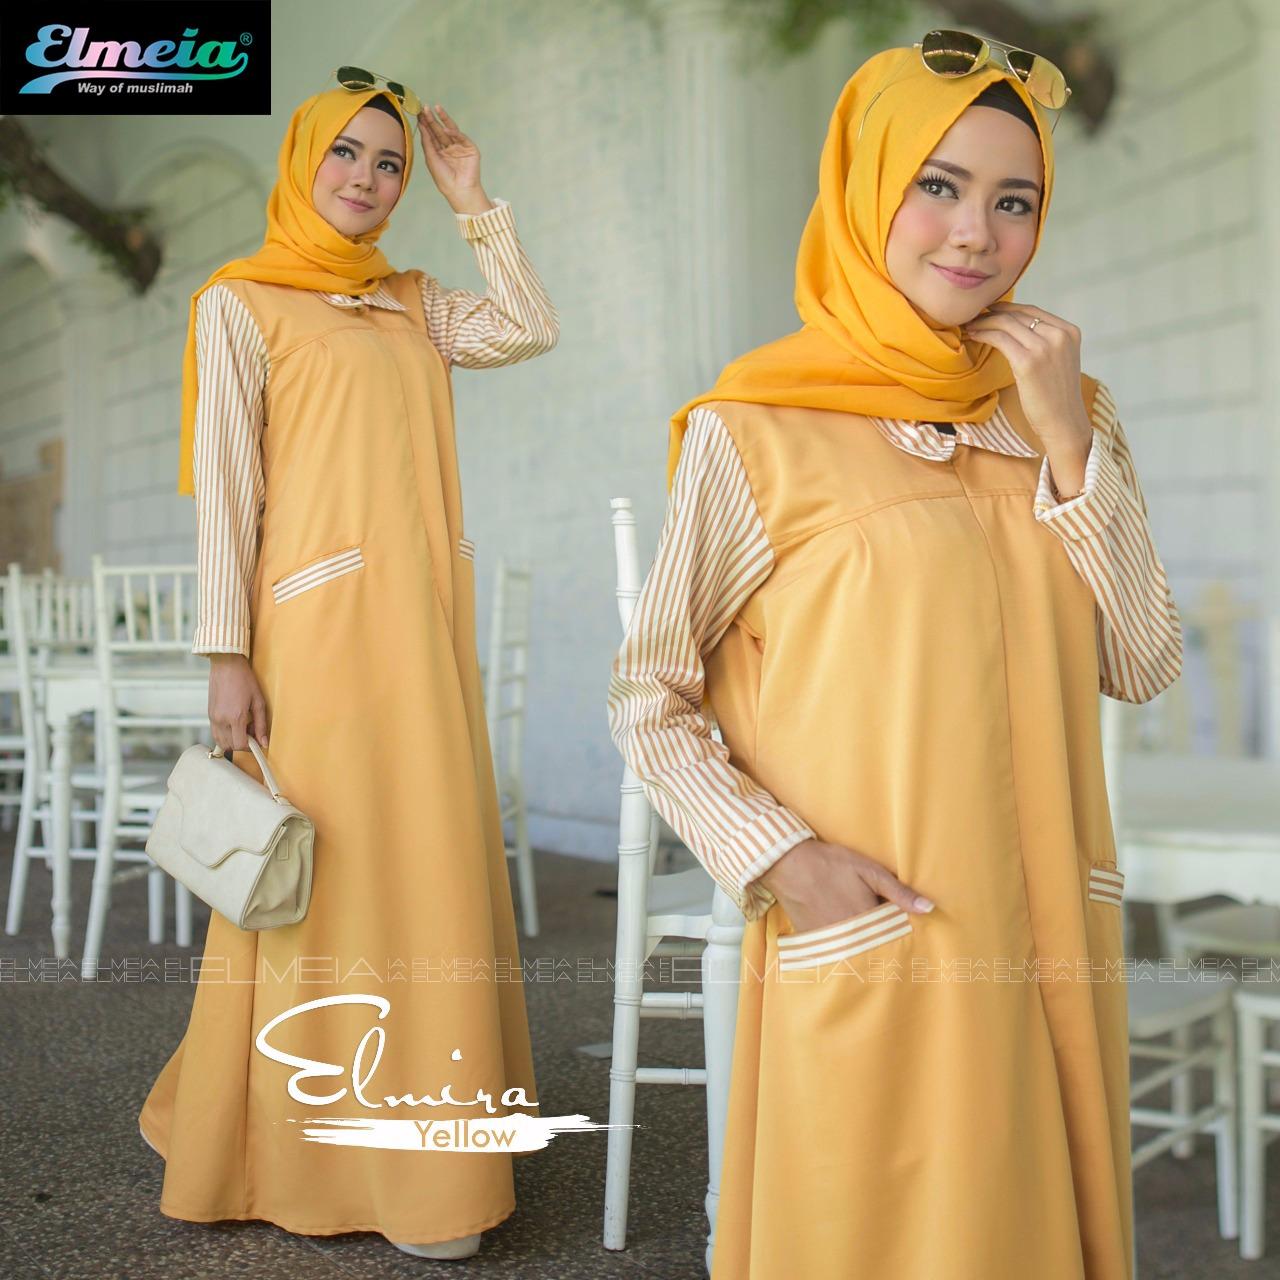 Baju muslim terbaru elmira by Elmeia yellow